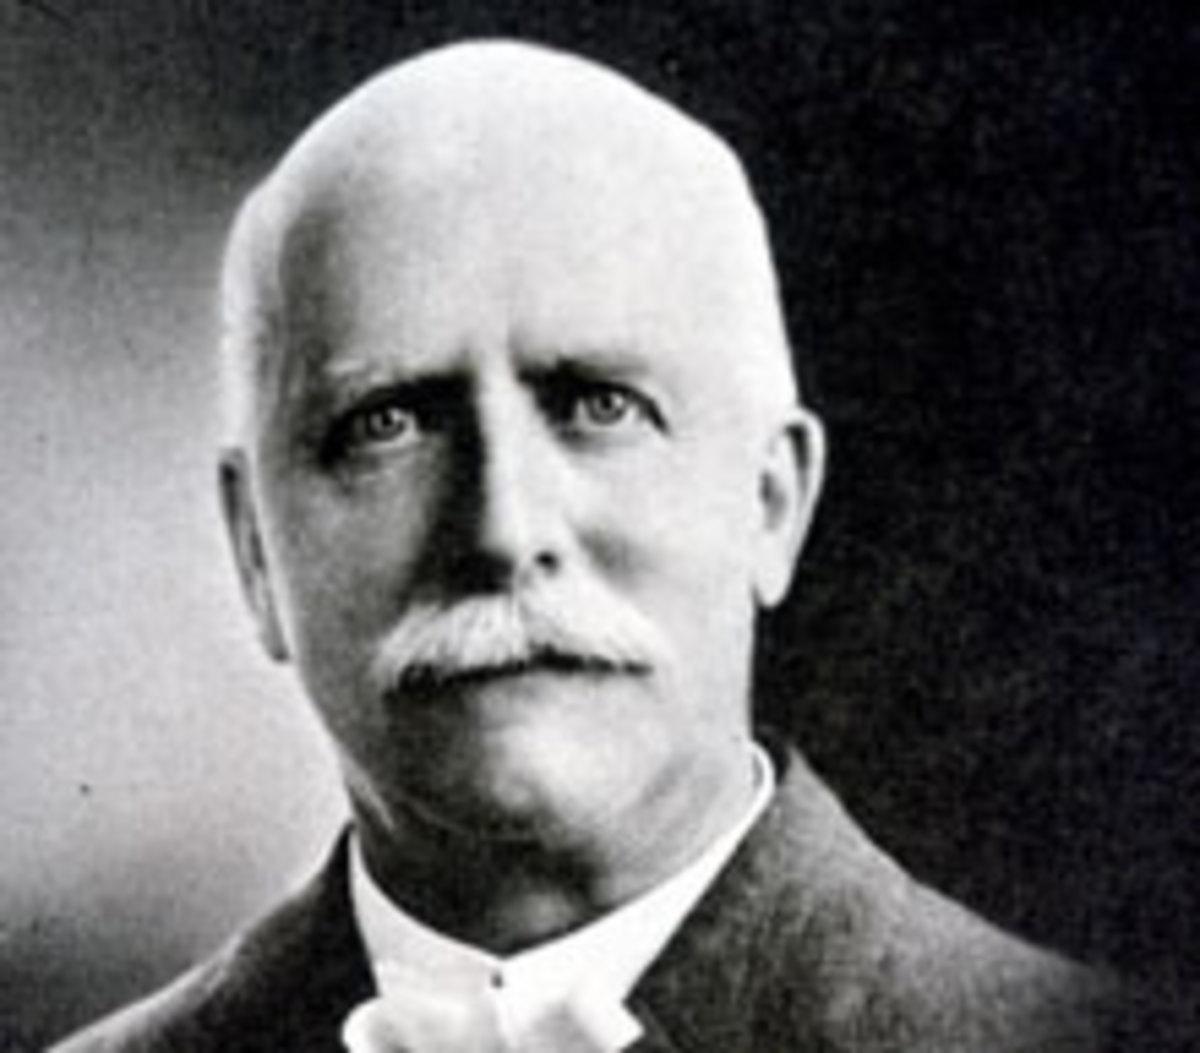 R.A. Torrey